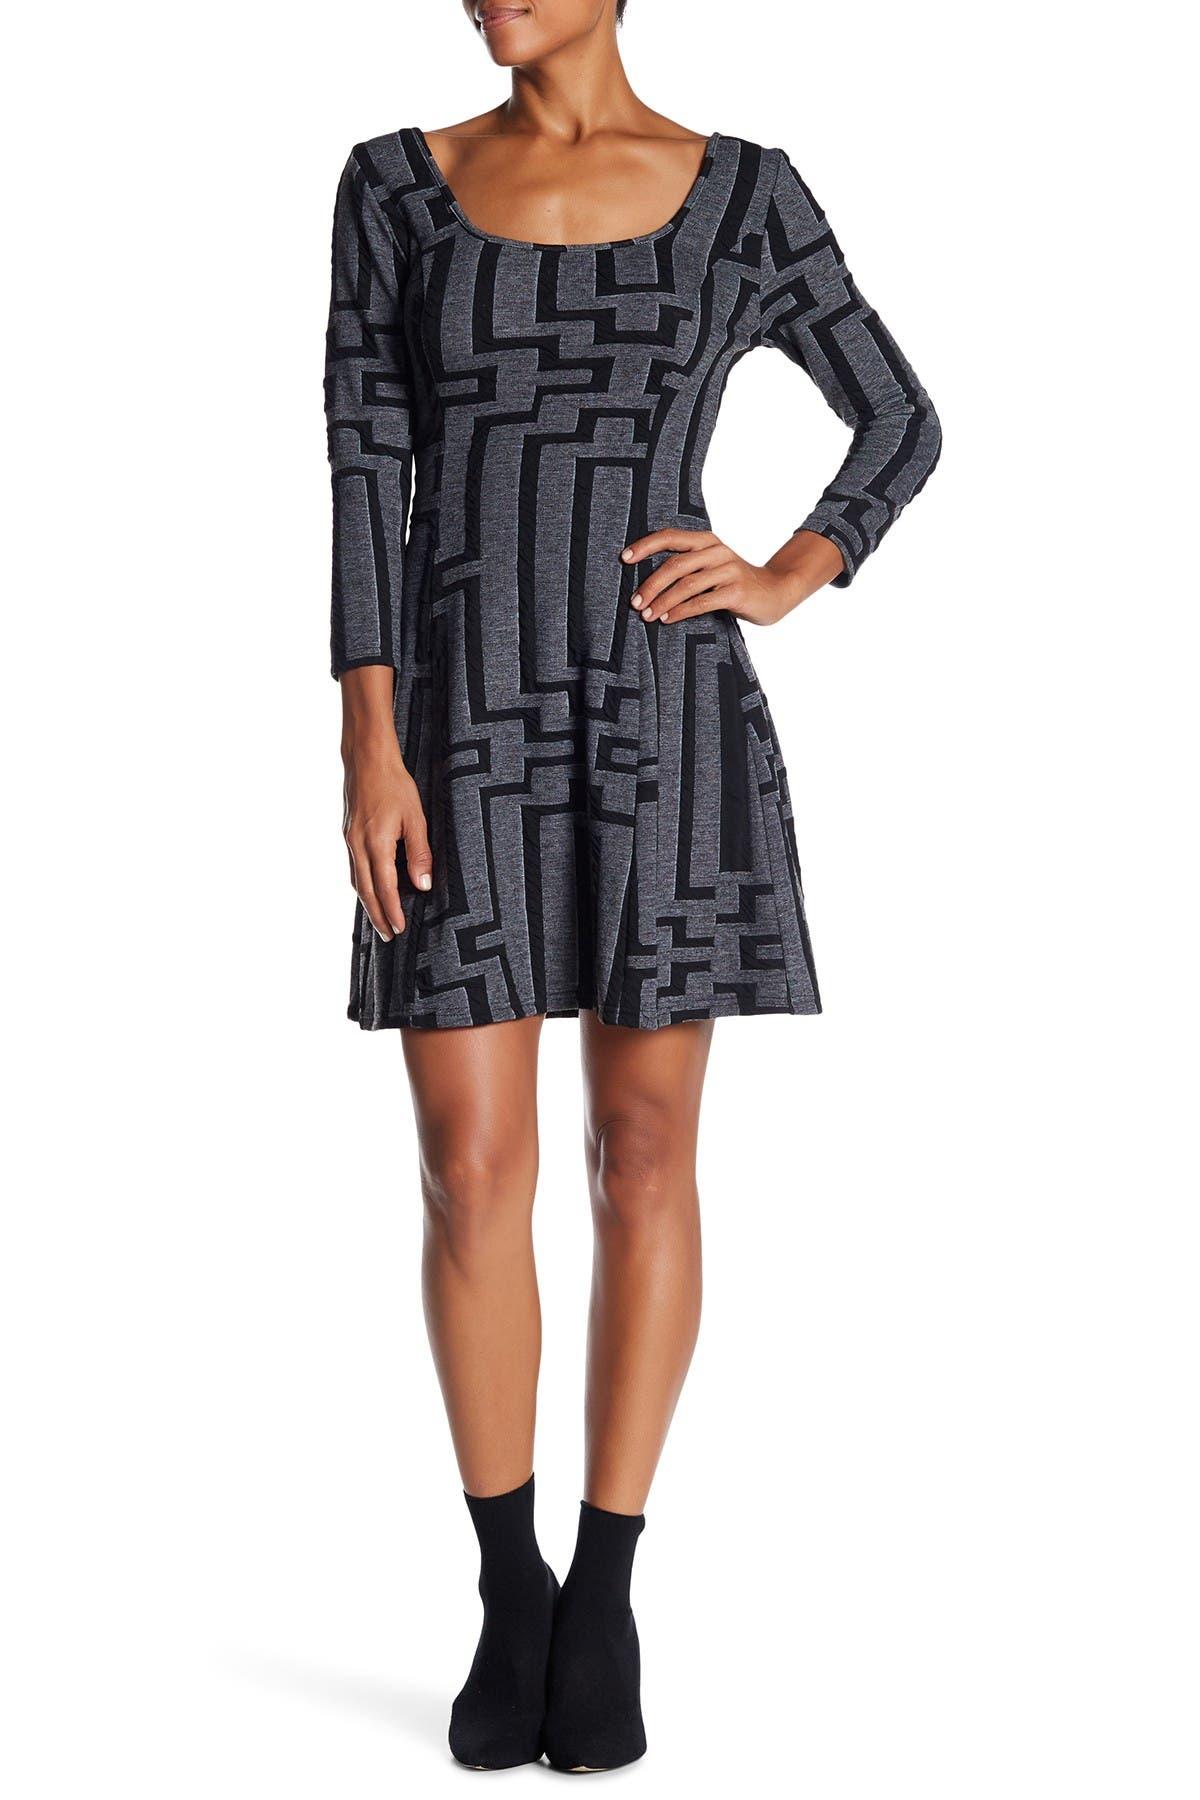 Image of Papillon Geo Print Knit Dress